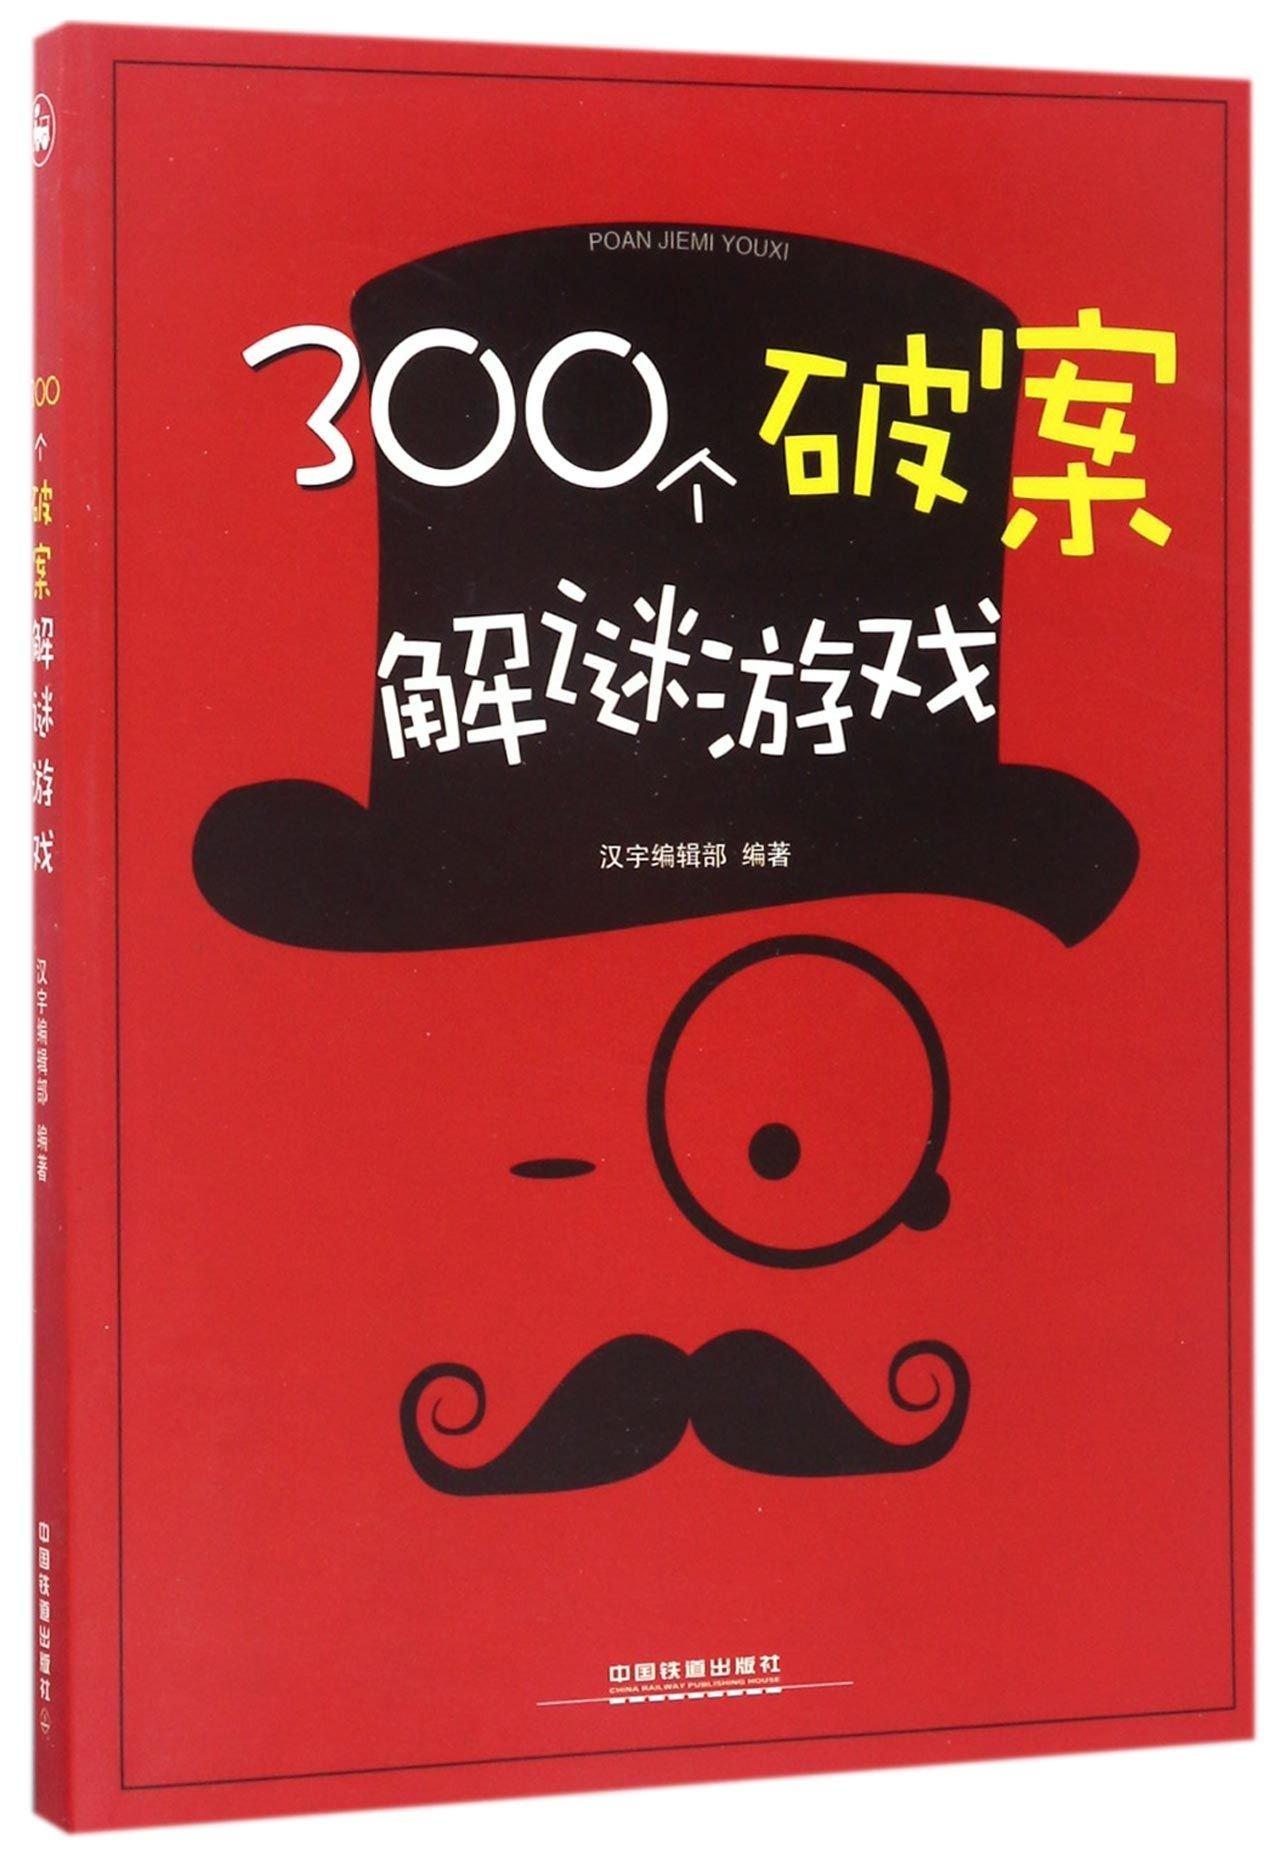 300 Logic Reasoning Games (Chinese Edition) ebook